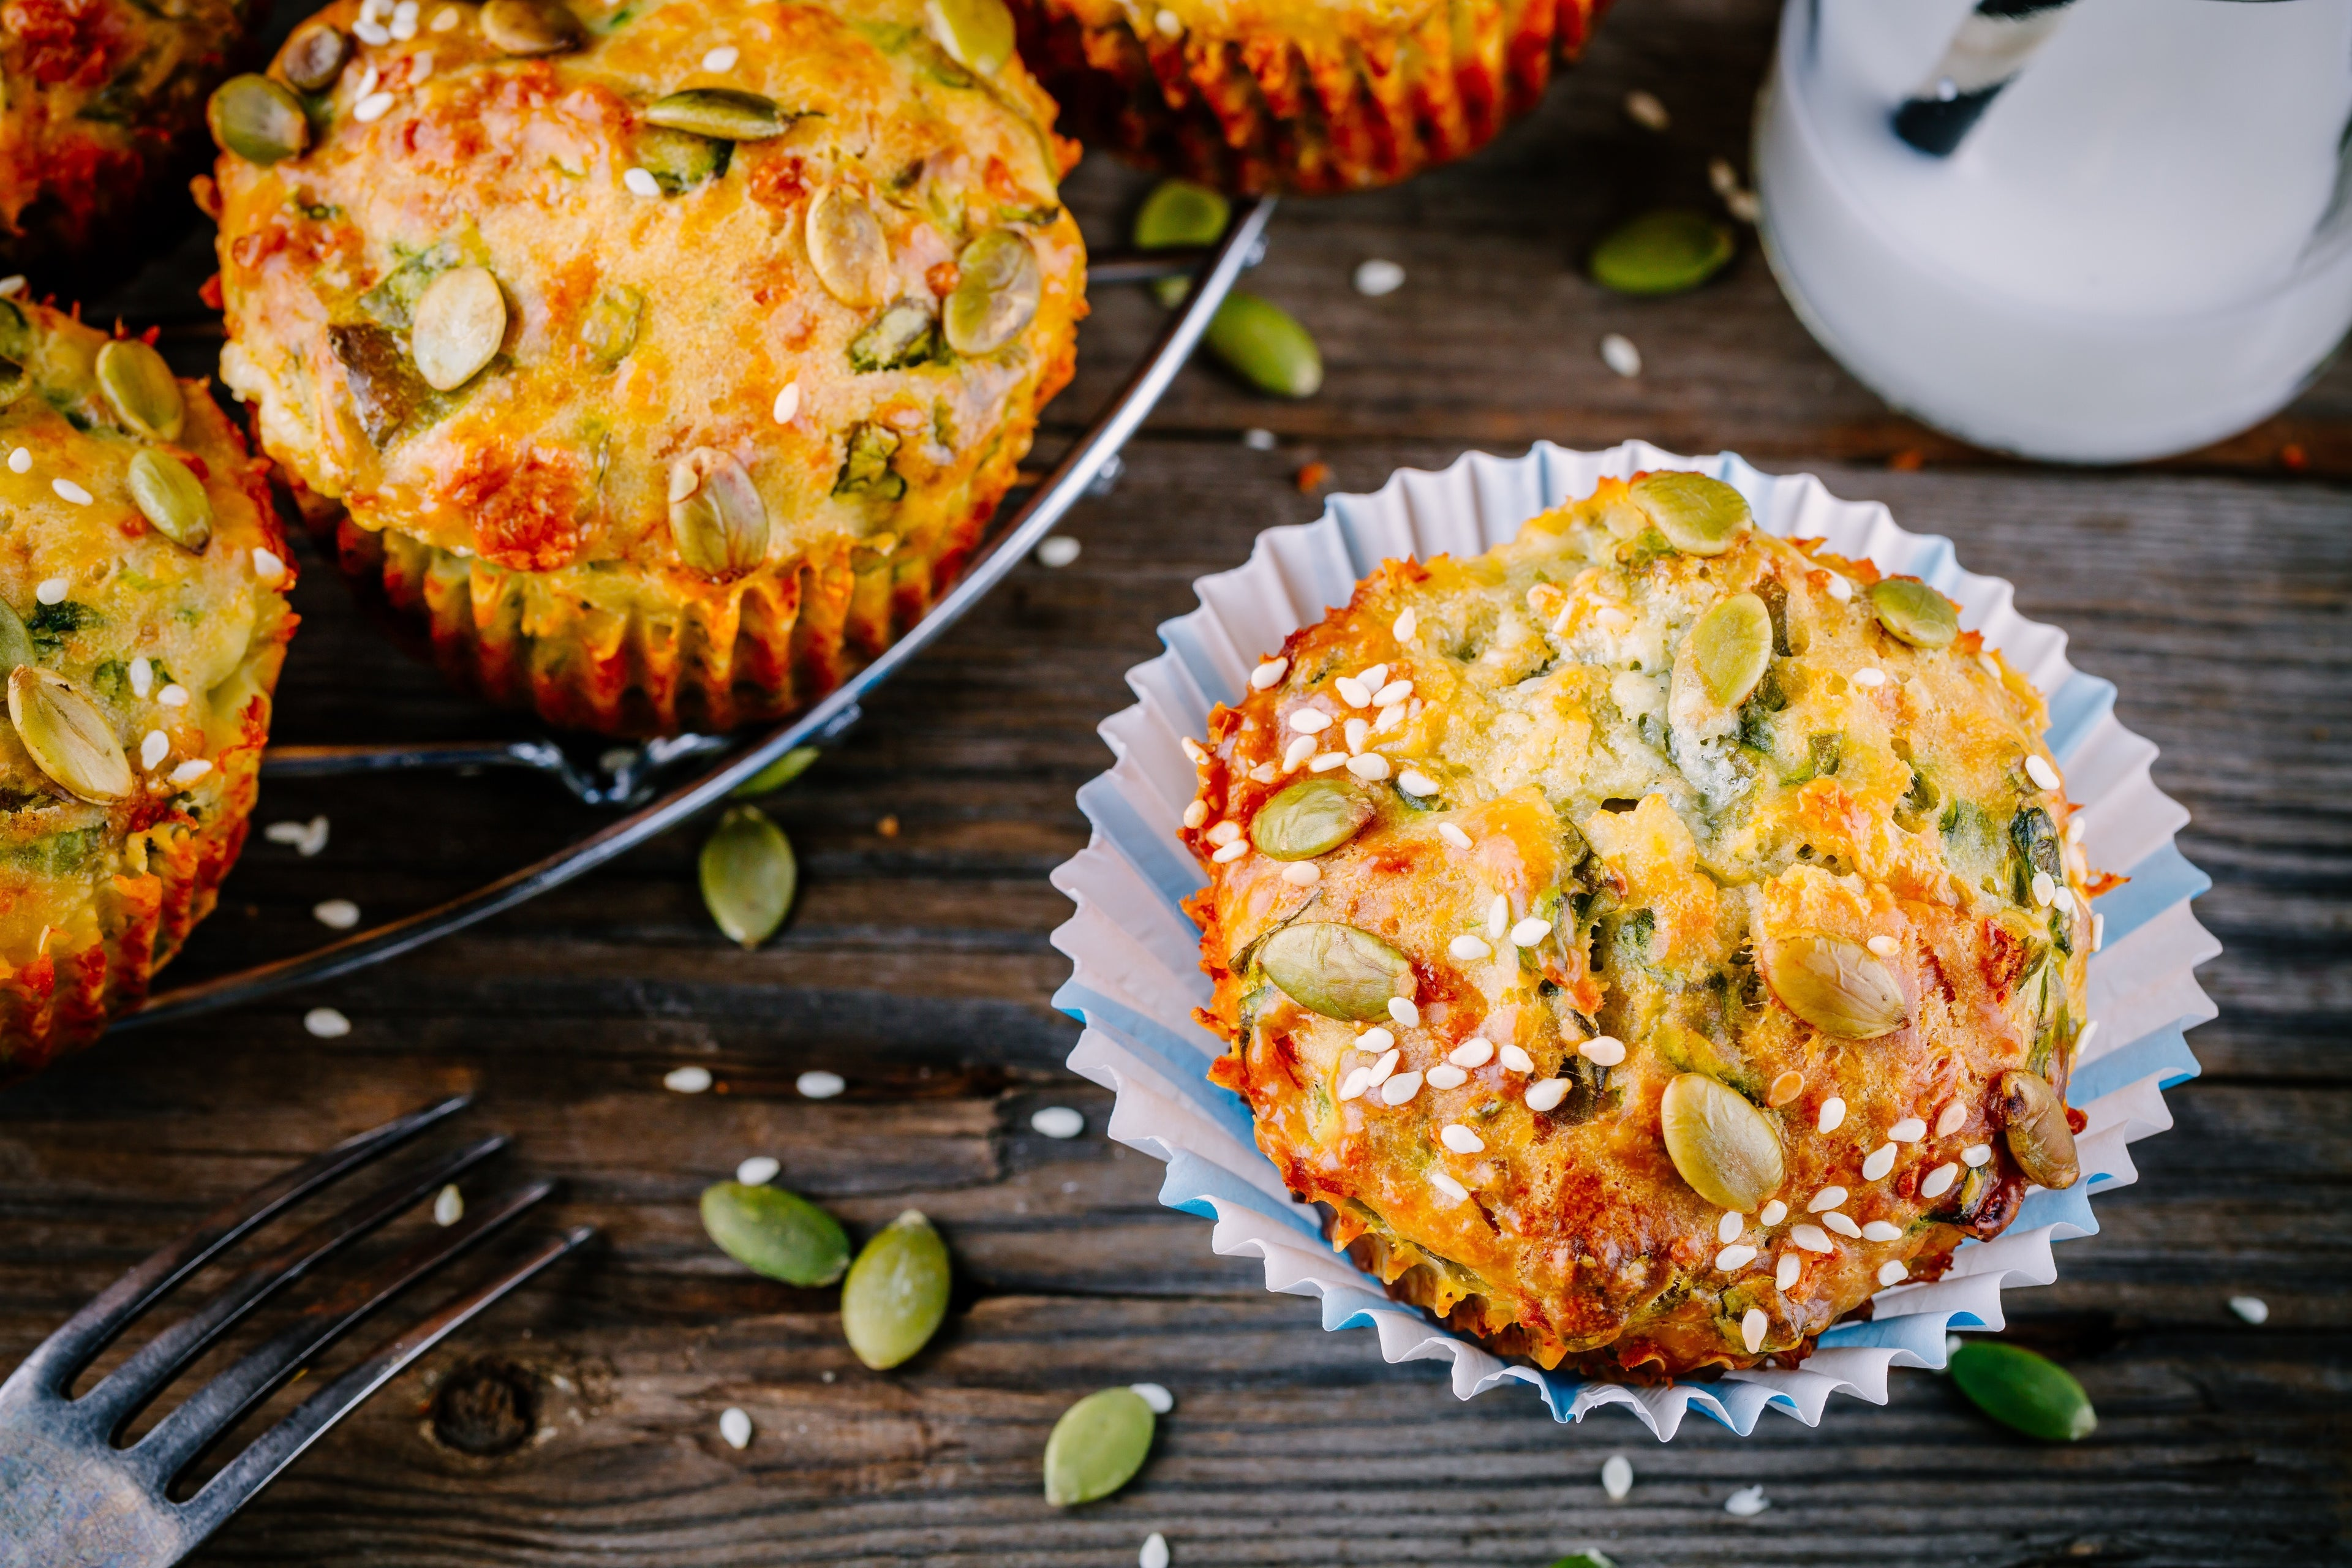 Broccoli-Cheese-Muffin_1.jpg